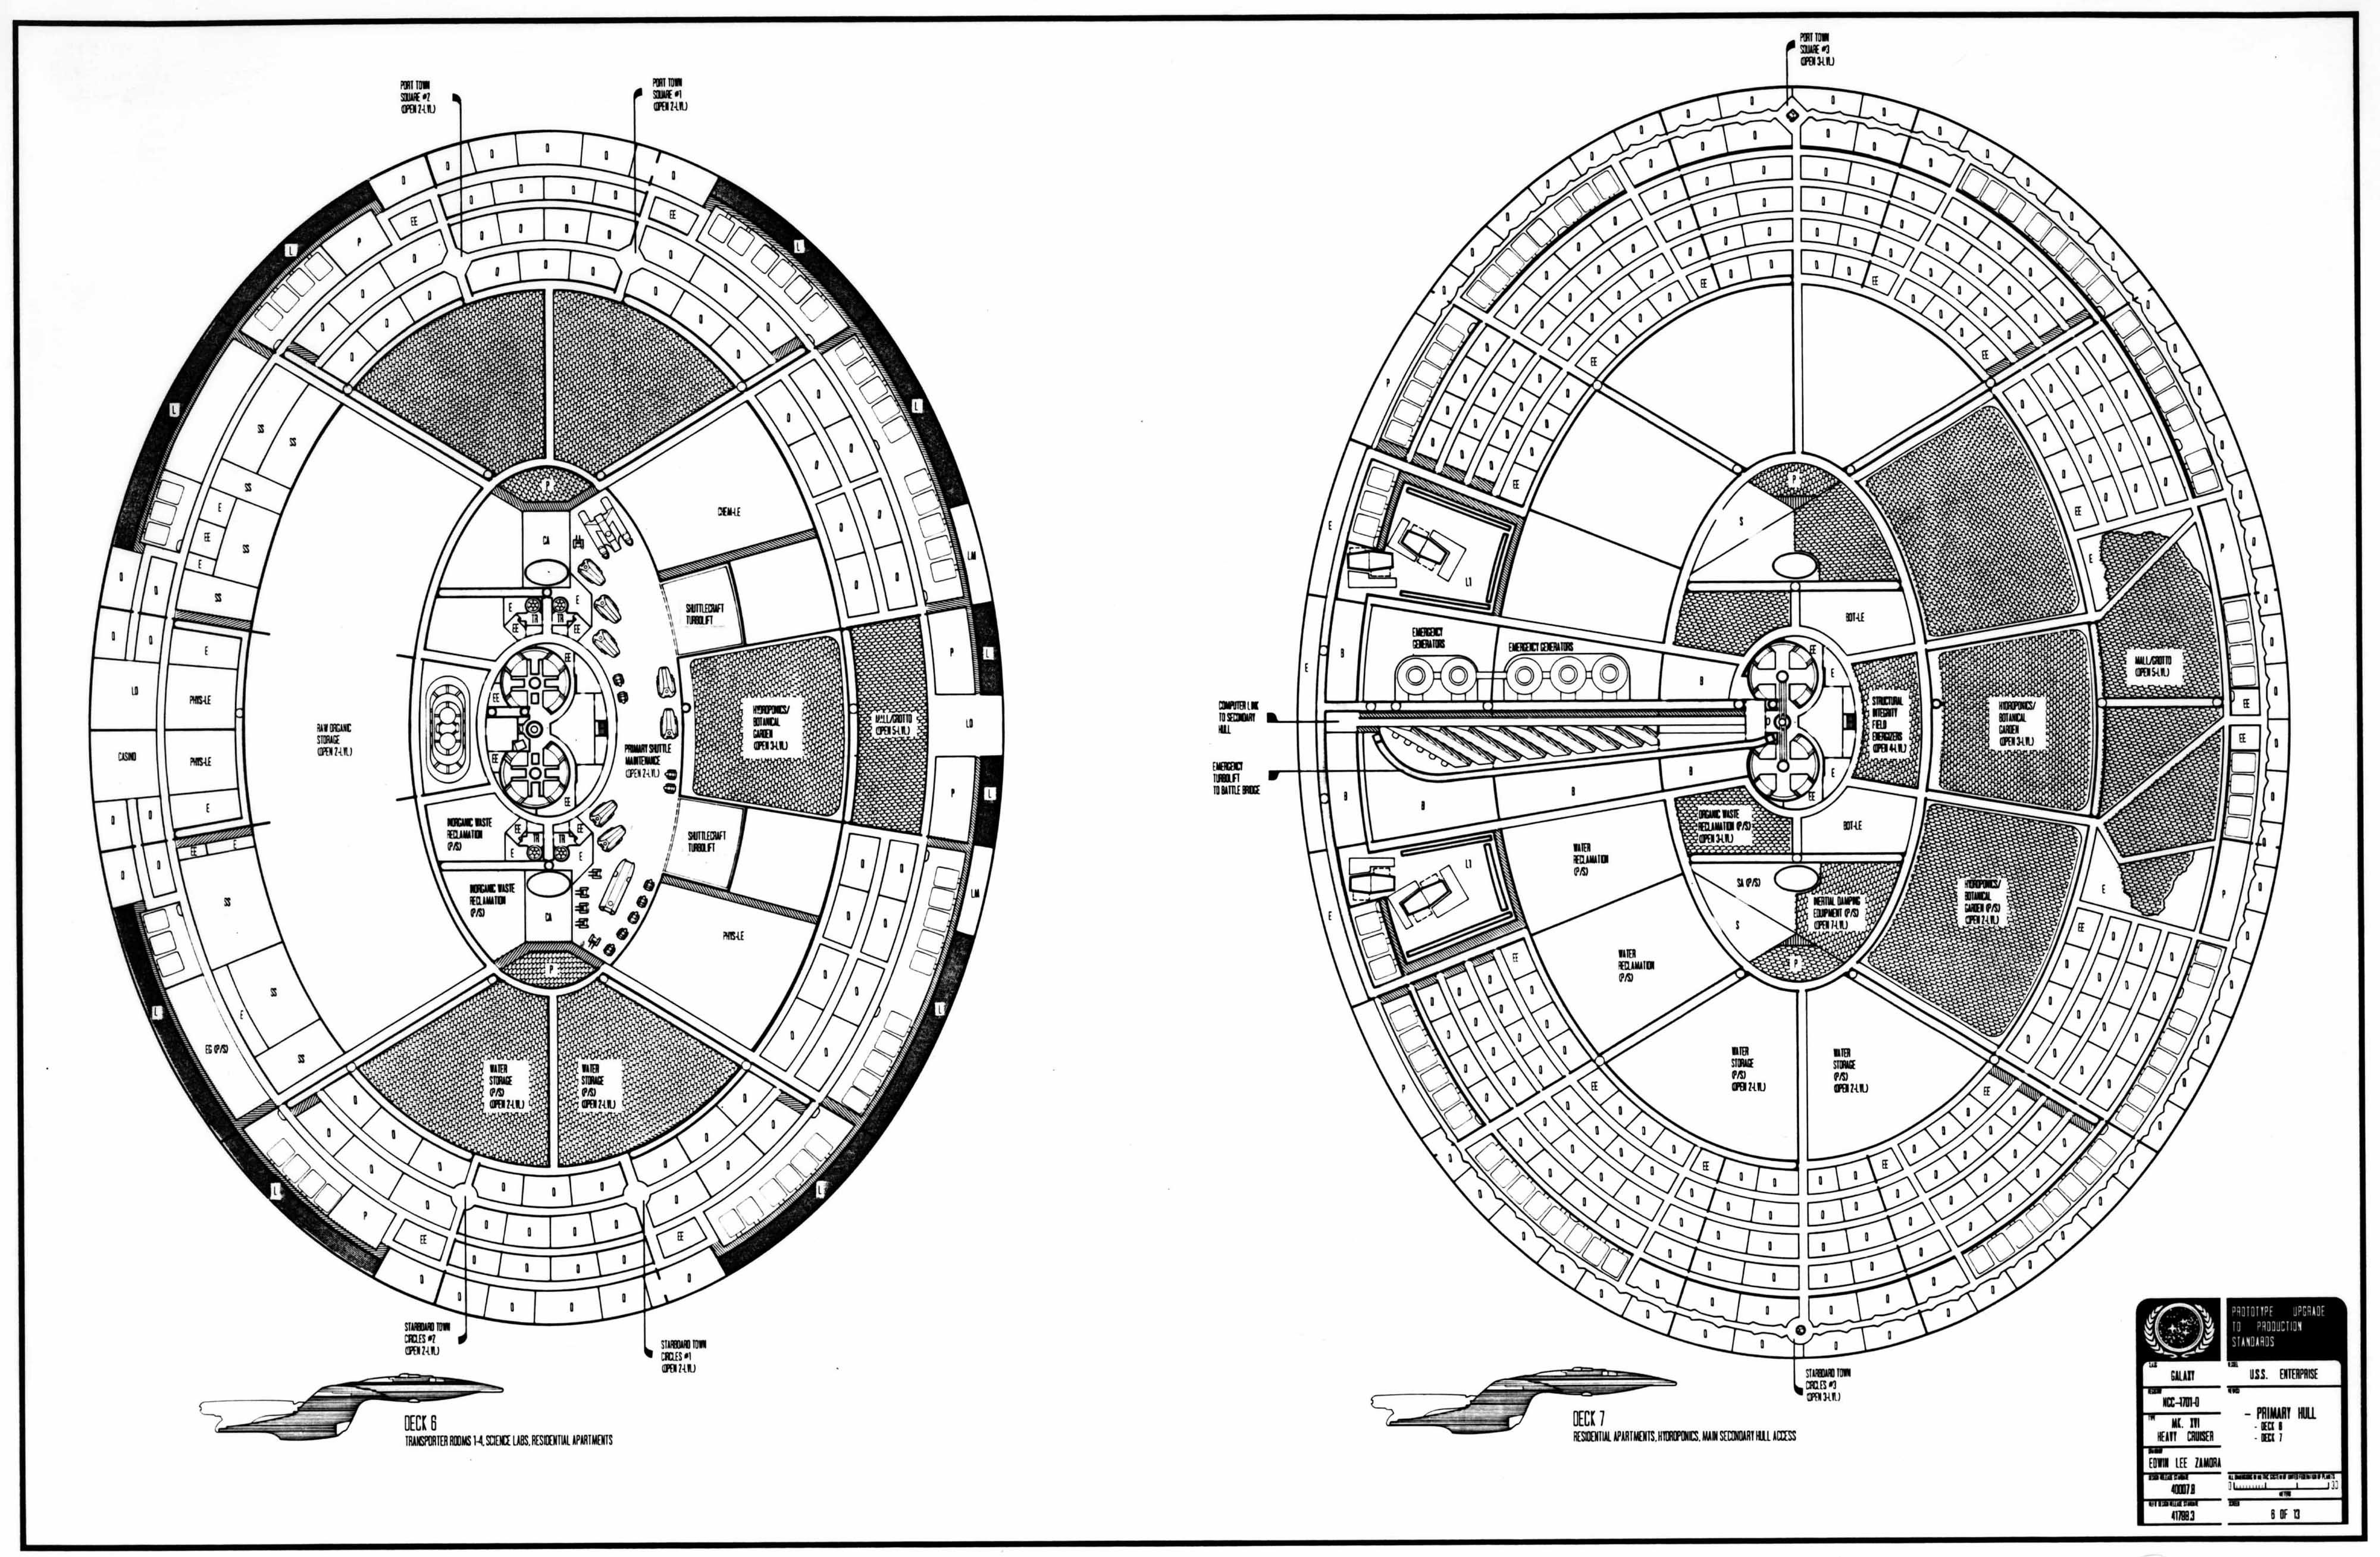 Enterprise D Schematics